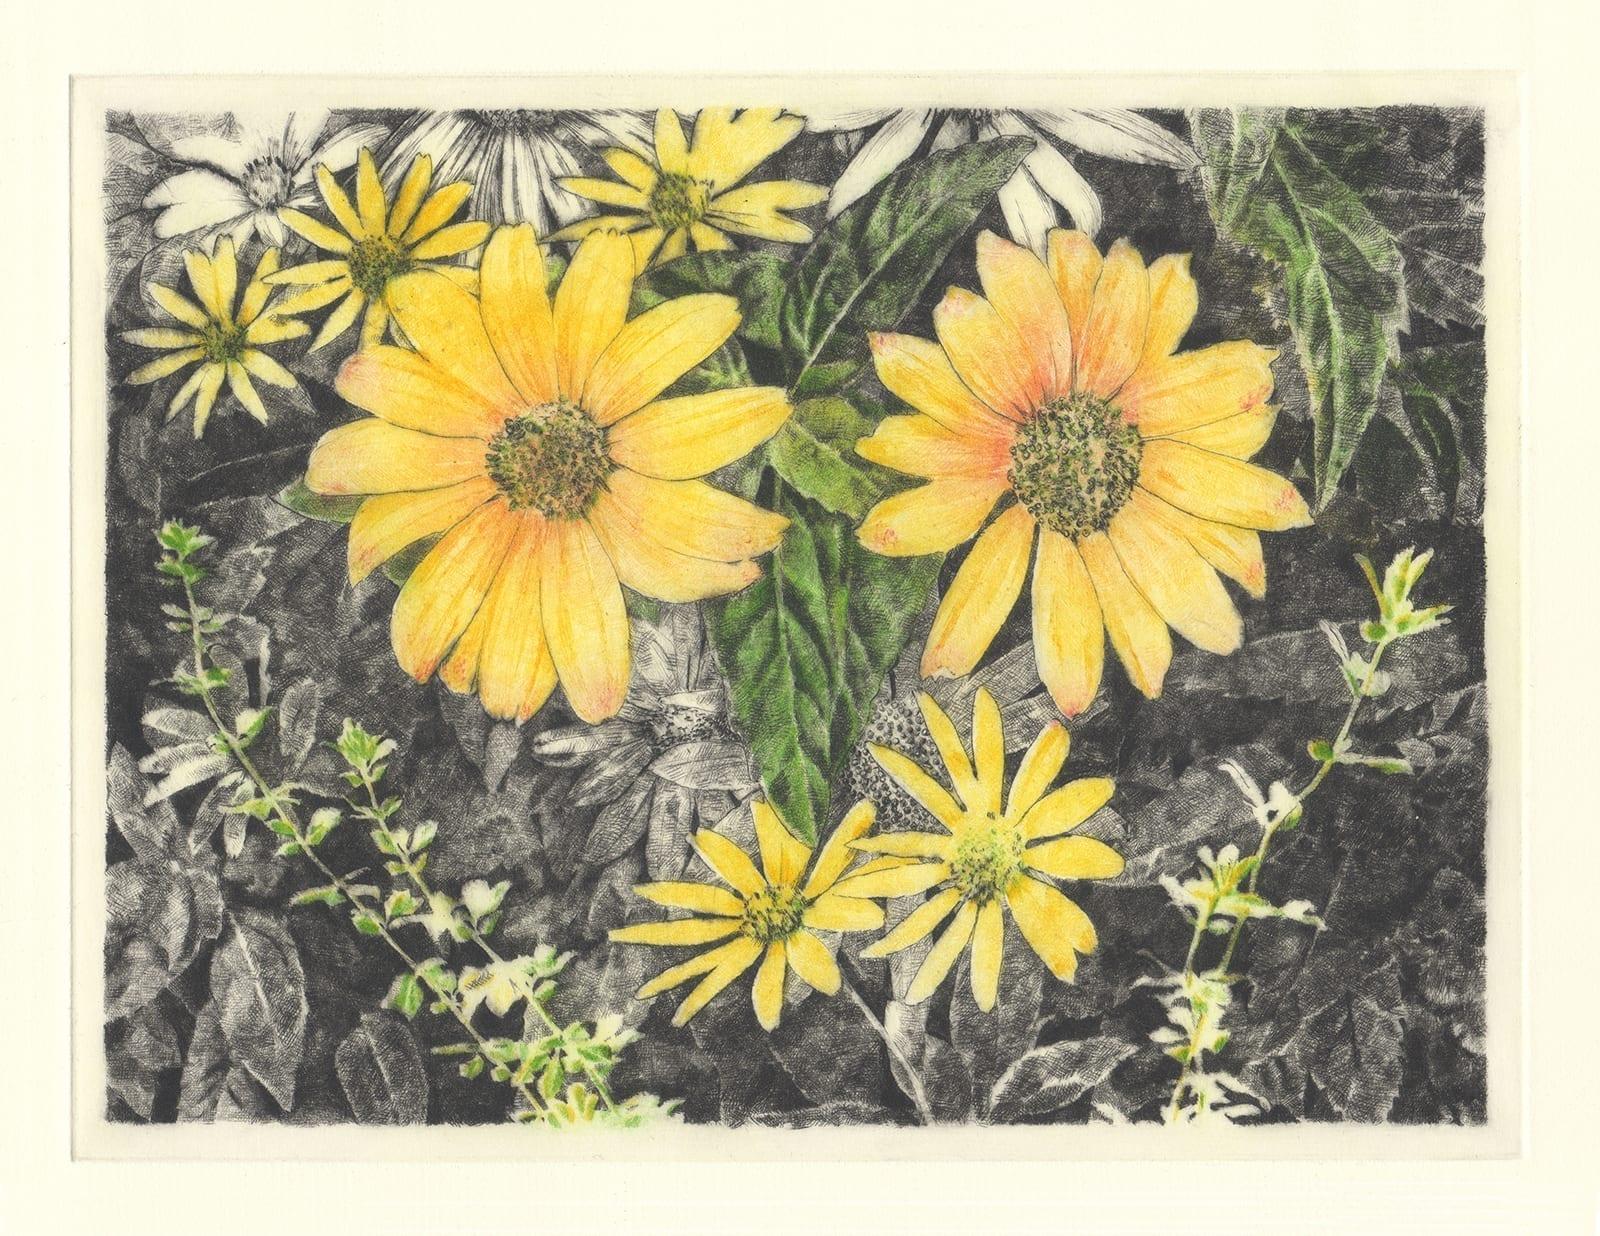 Talking flowers: Sunflower (drypoint etching by Yaemi Shigyo)